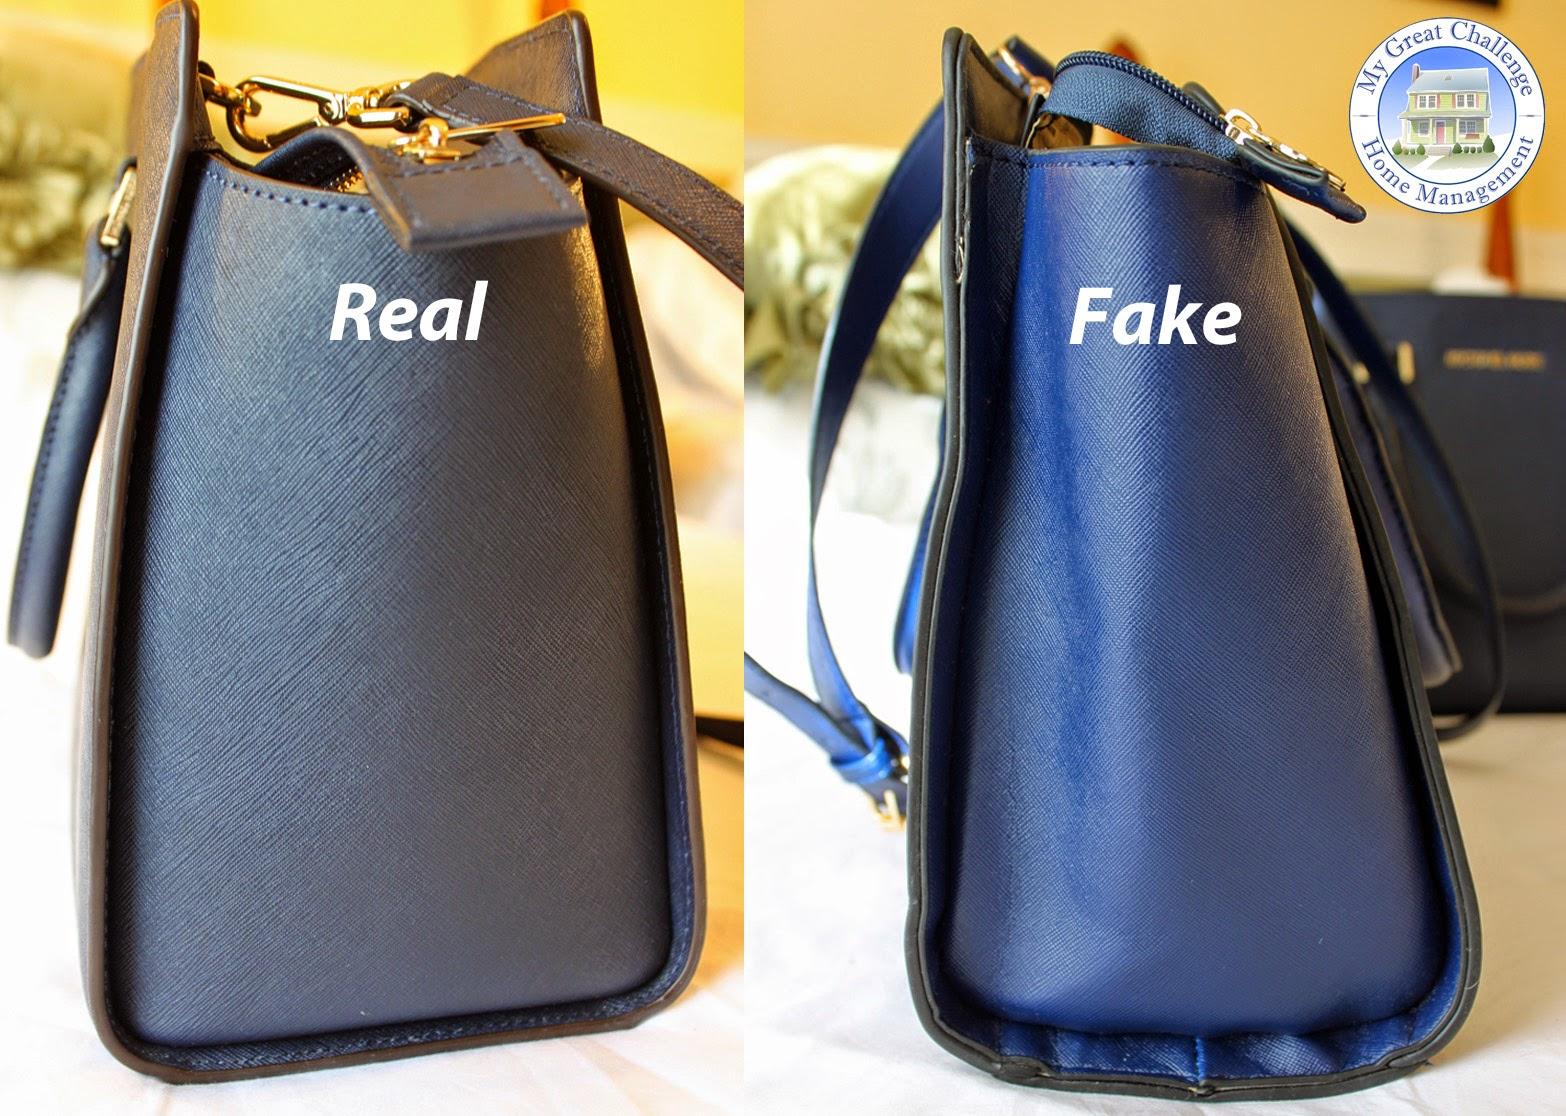 brown leather prada handbag - My Great Challenge: Michael Kors Selma - Fake VS. Real Comparison